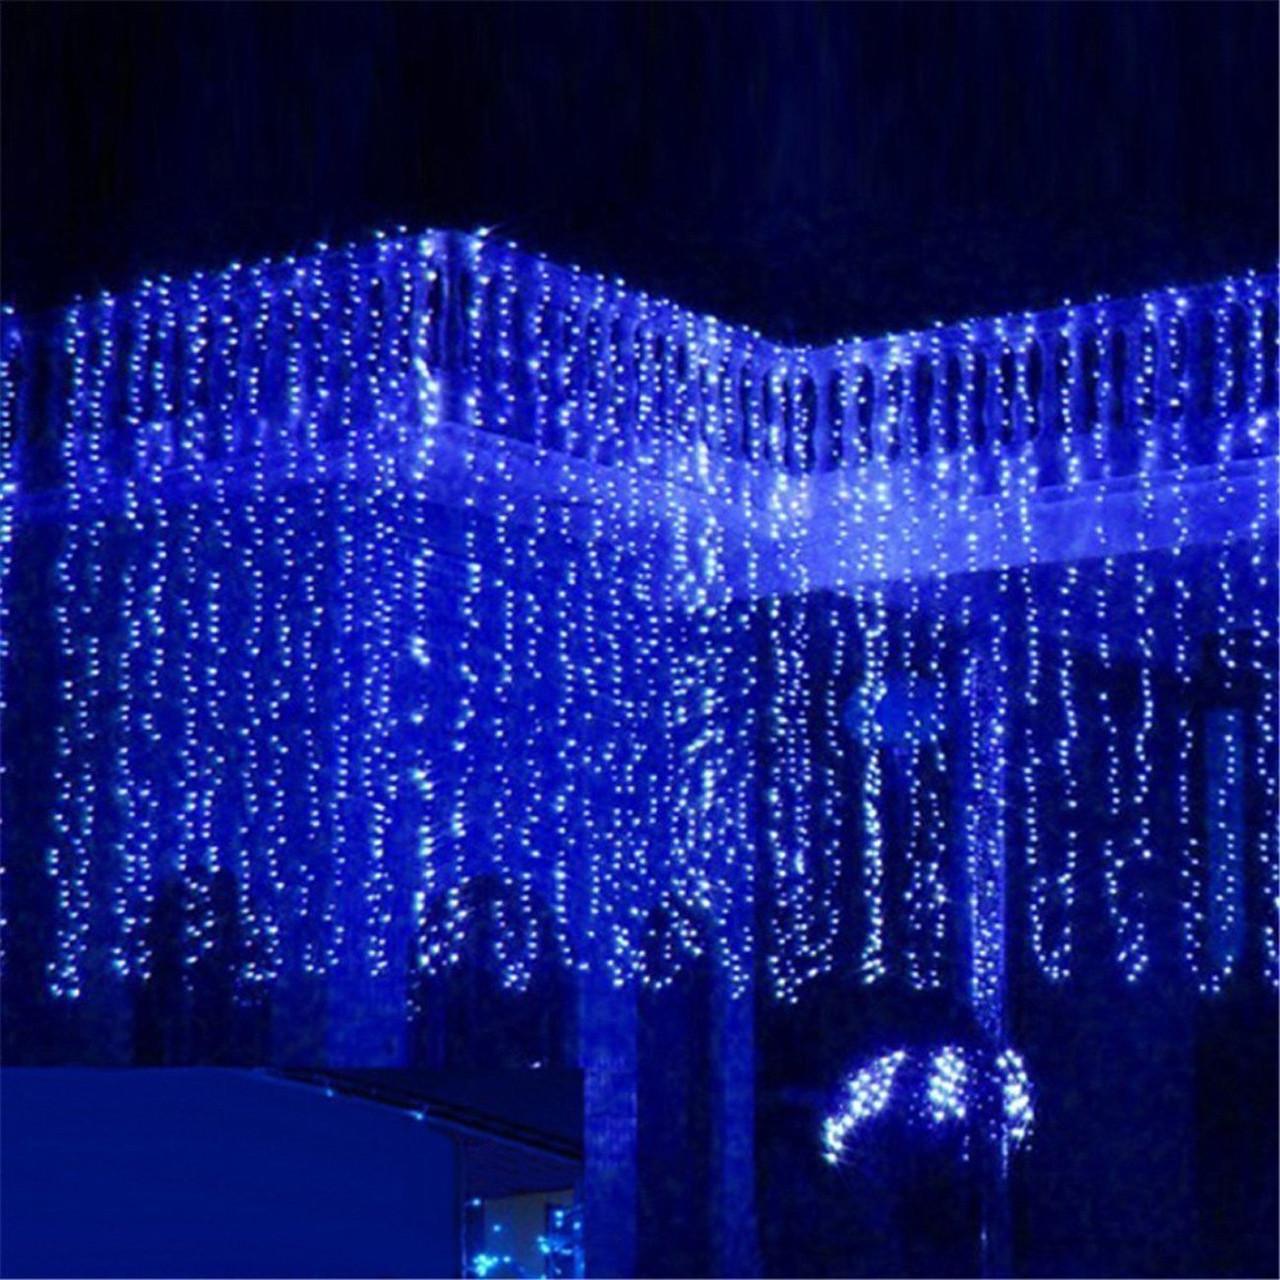 Синяя Гирлянда Свеча Штора 3х3м 480 led- на черном проводе, синяя, занавес